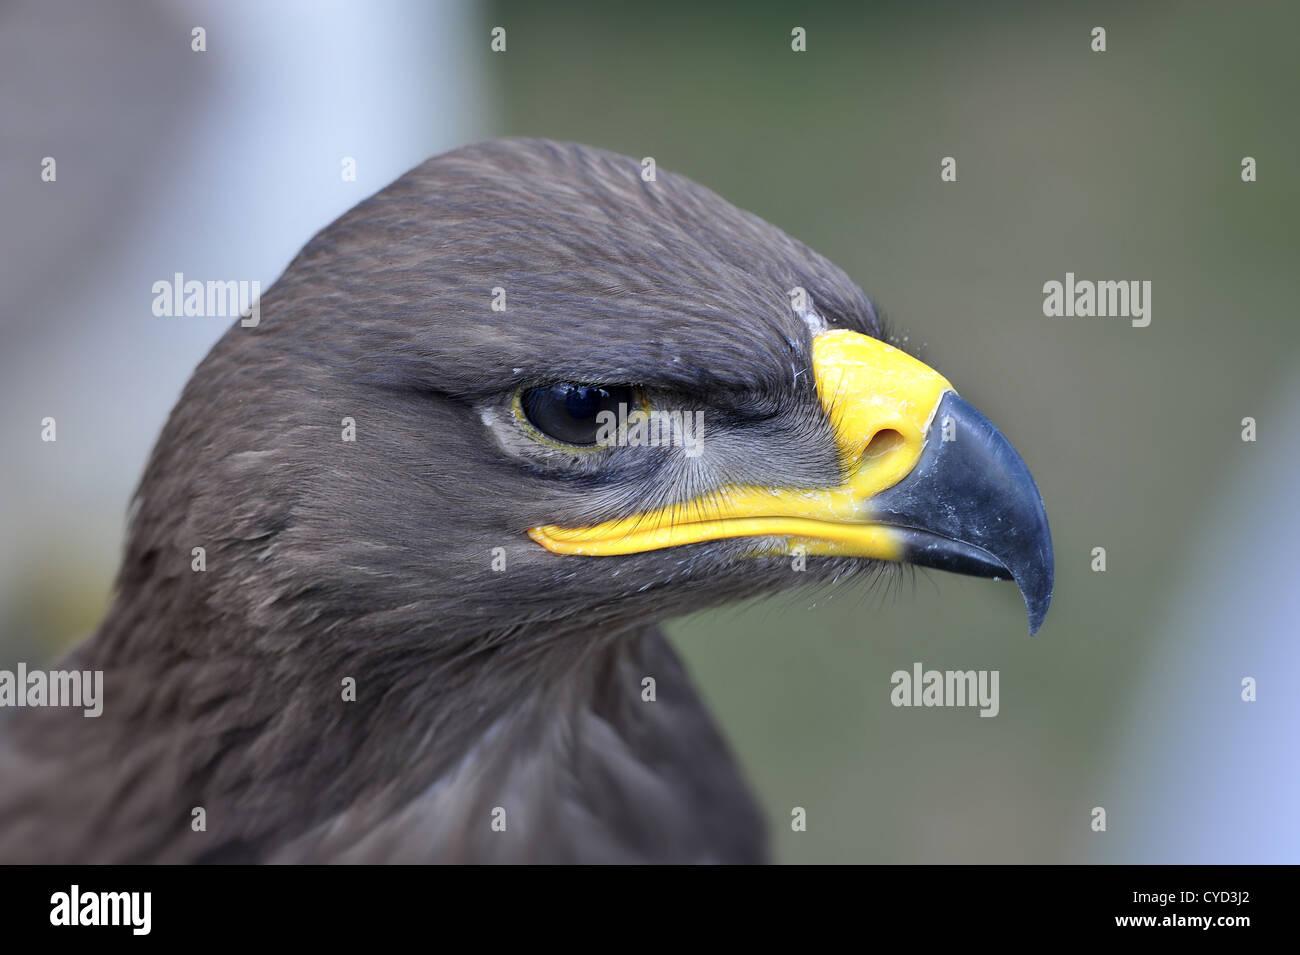 Águila de estepa de cabeza y hombros cone que sharp busca pico Foto de stock